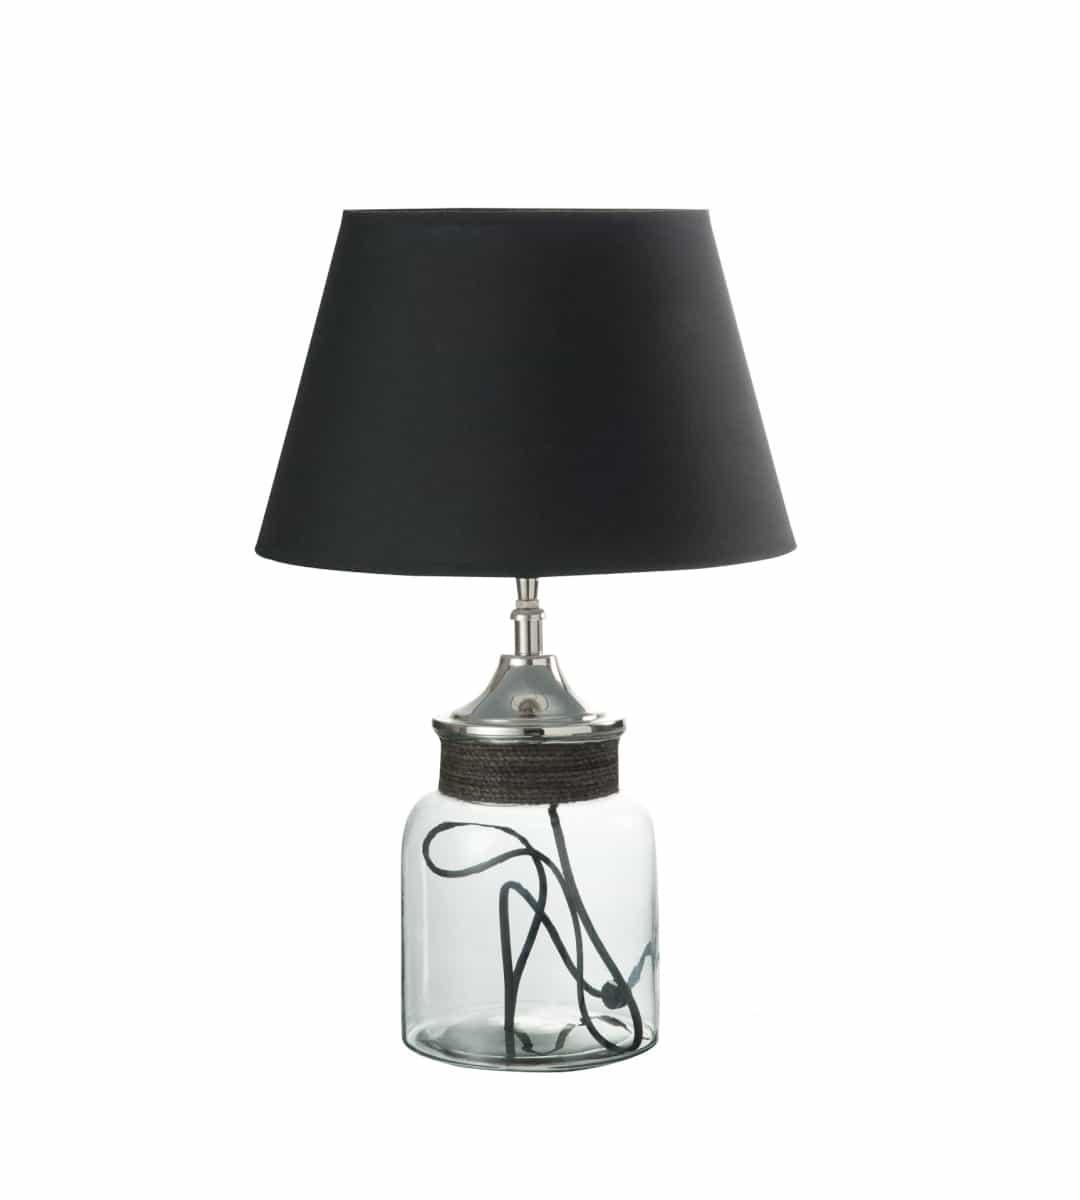 tischlampe pot aus glas aluminium mit stoffschirm. Black Bedroom Furniture Sets. Home Design Ideas